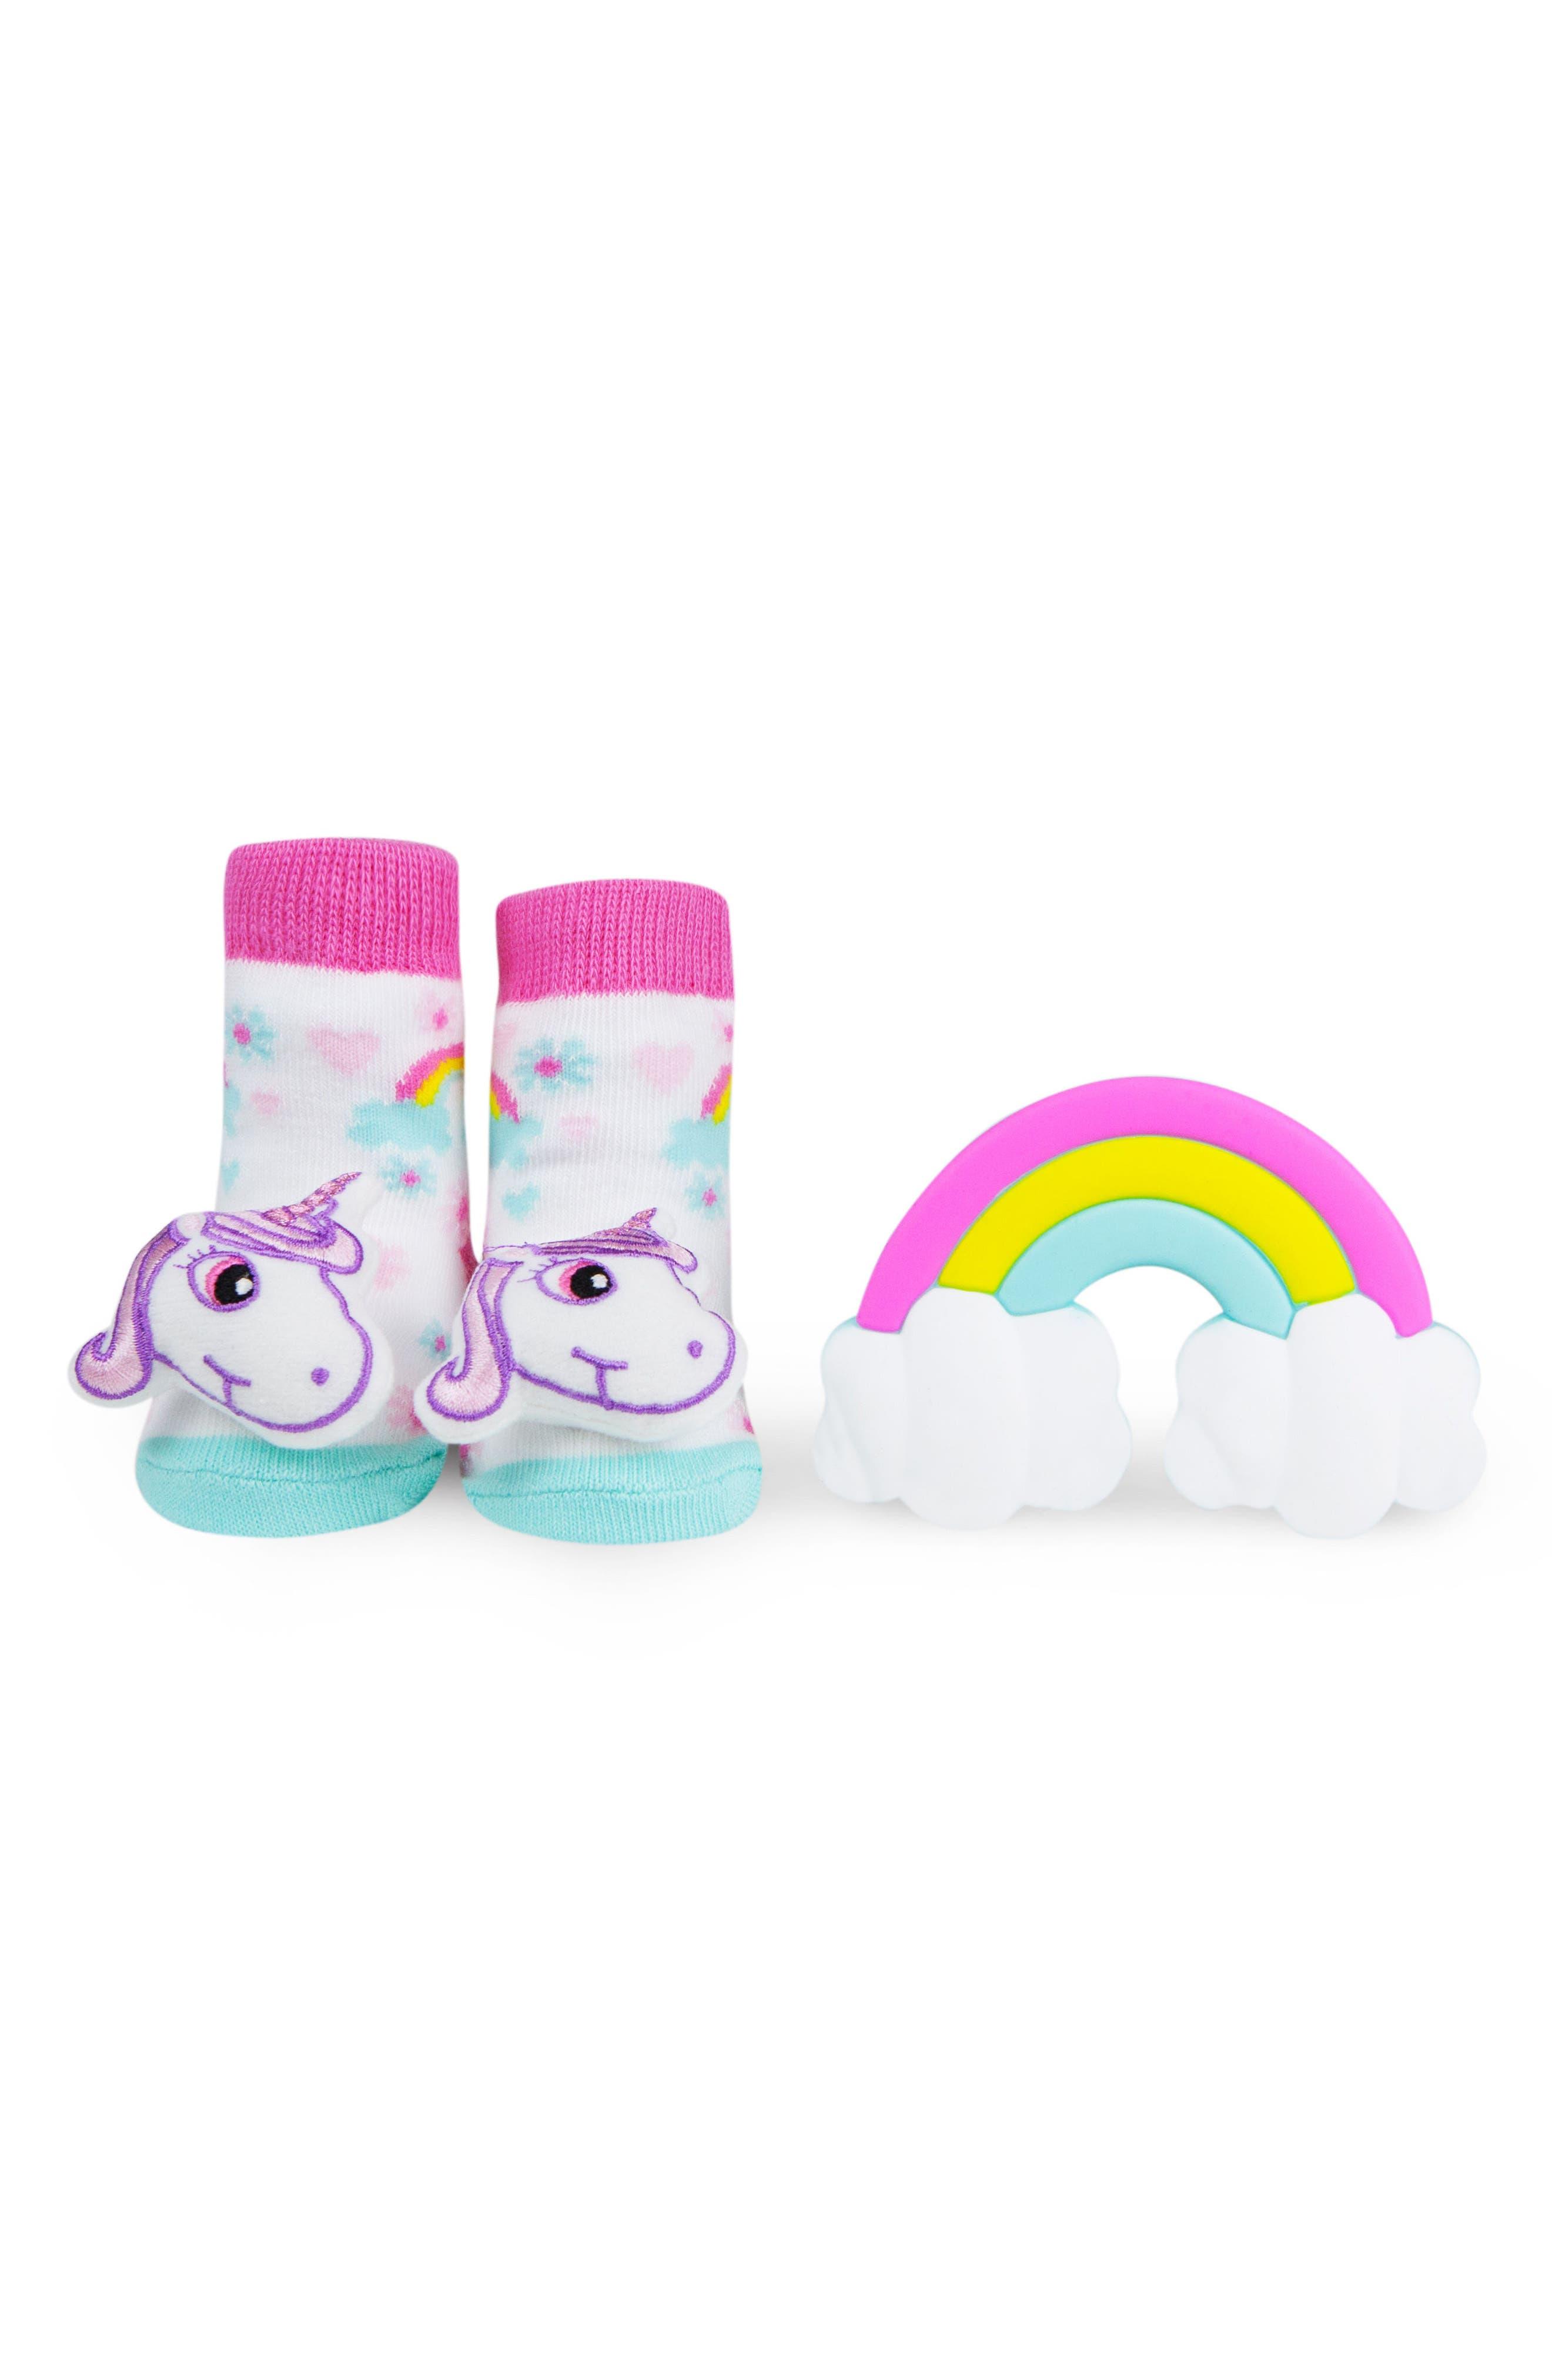 & Friends Unicorn Rattle Socks & Teether Gift Set,                         Main,                         color, 100